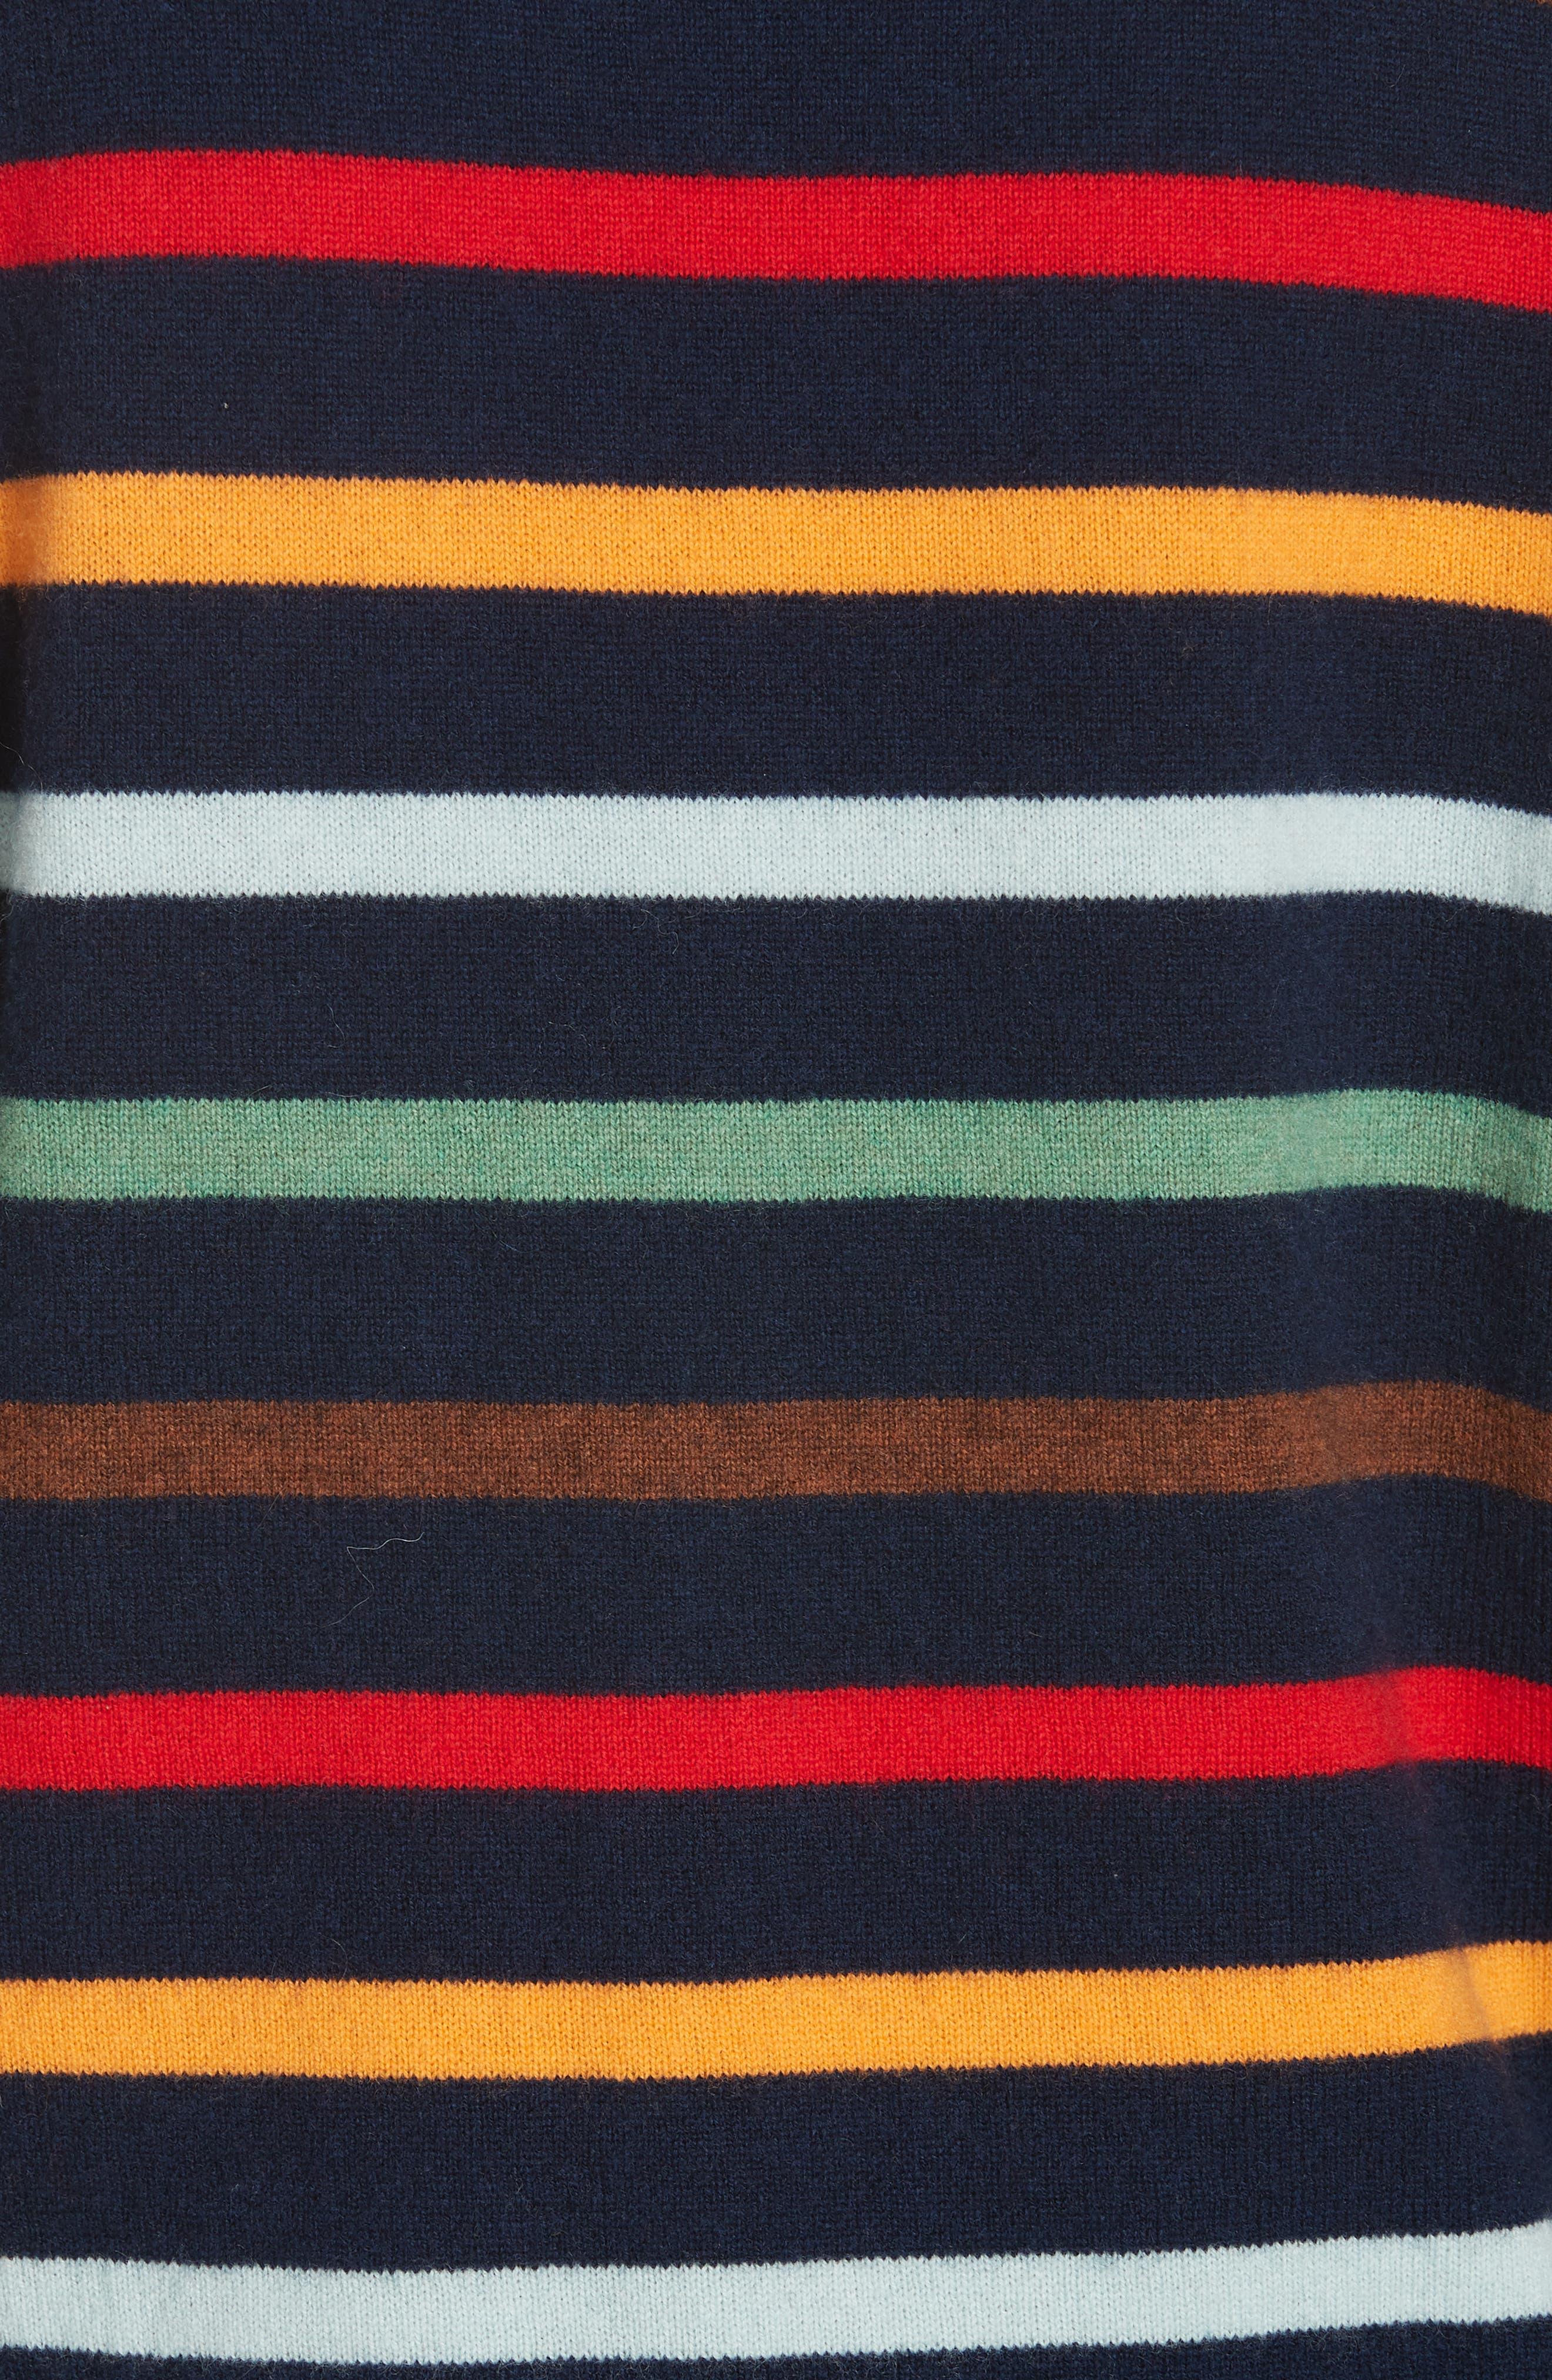 Rainbow Neat Wool & Cashmere Sweater,                             Alternate thumbnail 5, color,                             NAVY/ RAINBOW